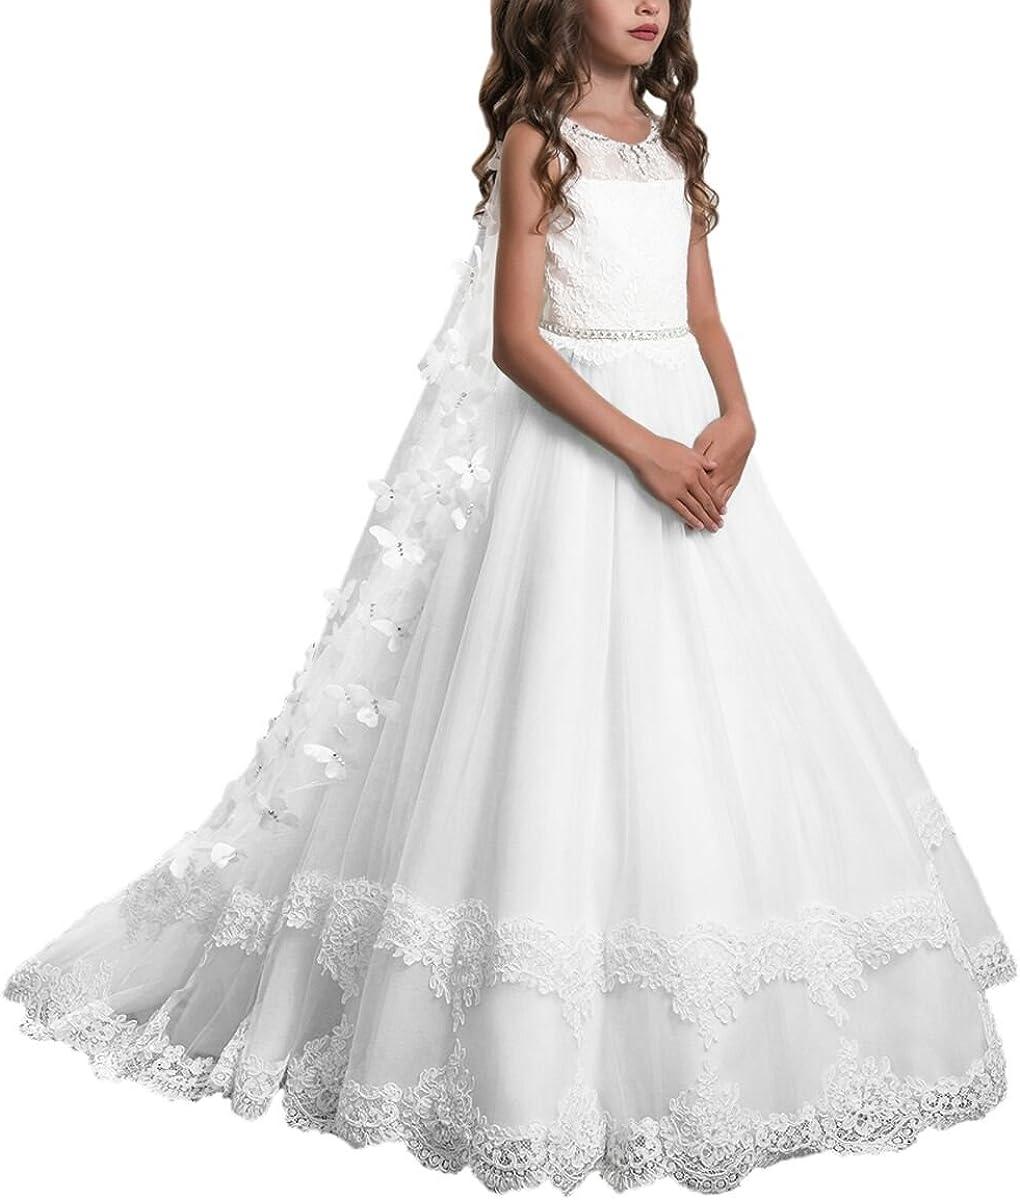 PLwedding Lace Flower Girls Dresses Communion Max 46% OFF P First Dress Latest item Kids